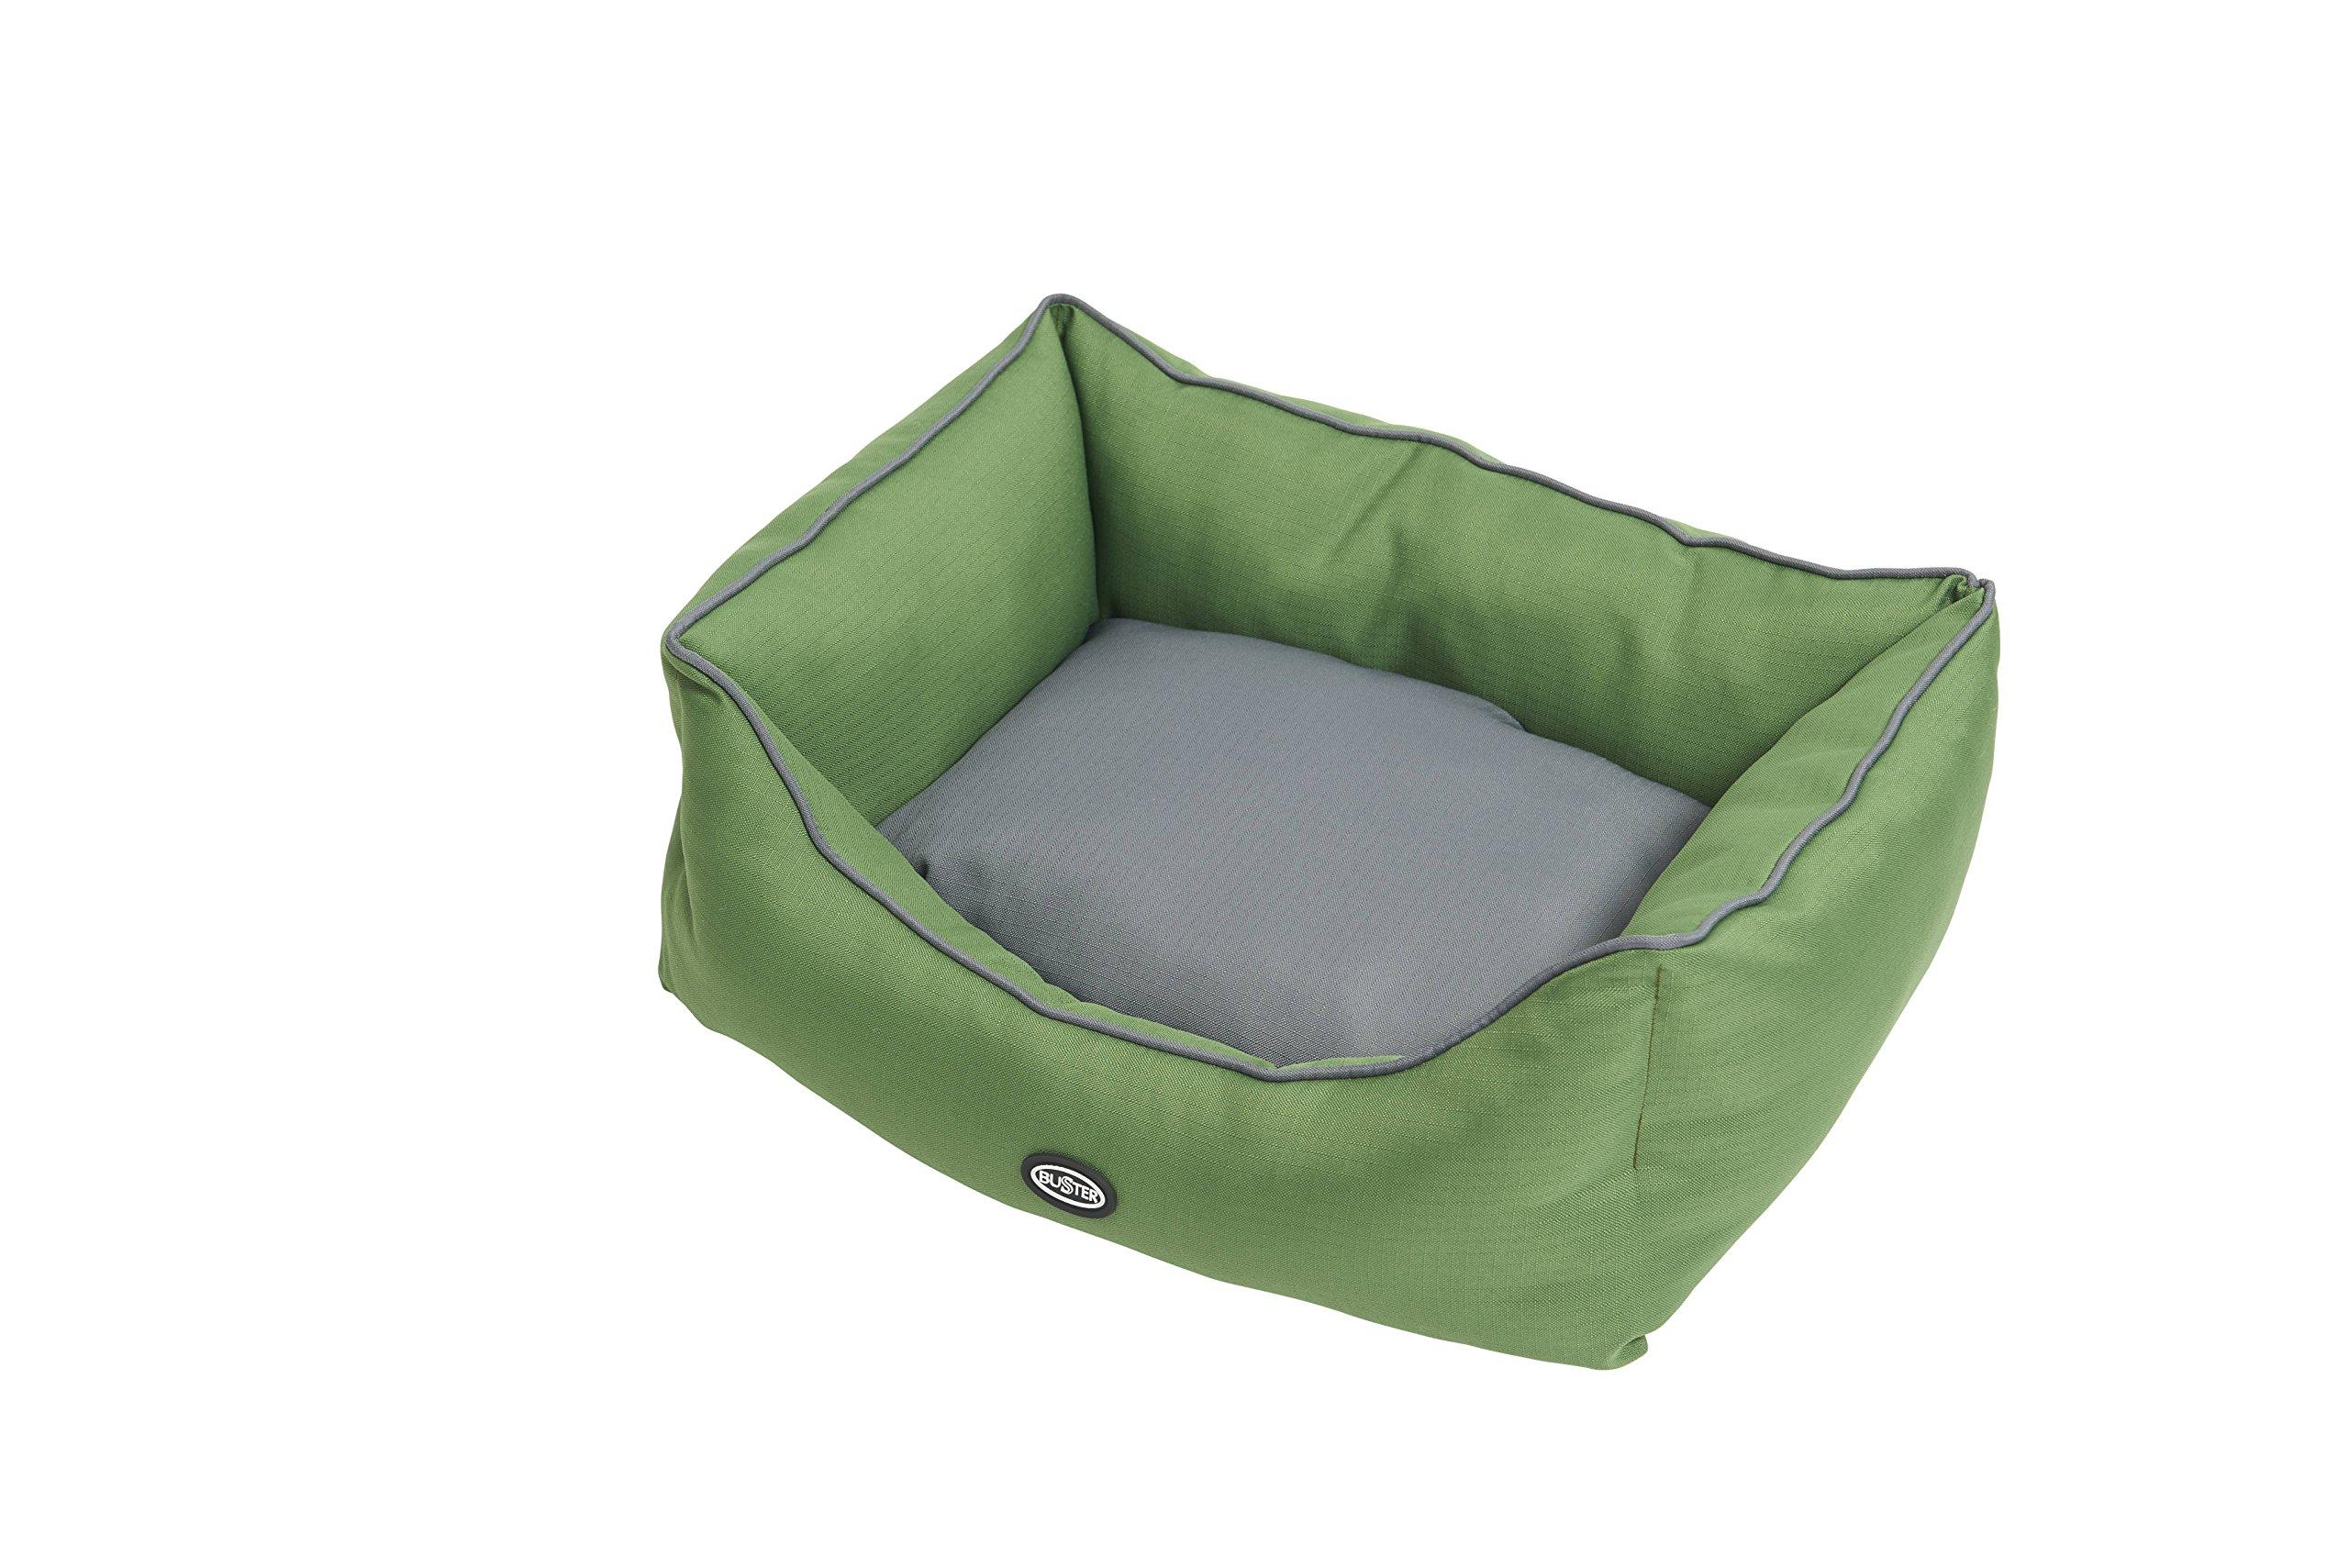 Kruuse Buster Sofa Bed, Artichoke Green/Steel Grey, 70 x 36 by Kruuse